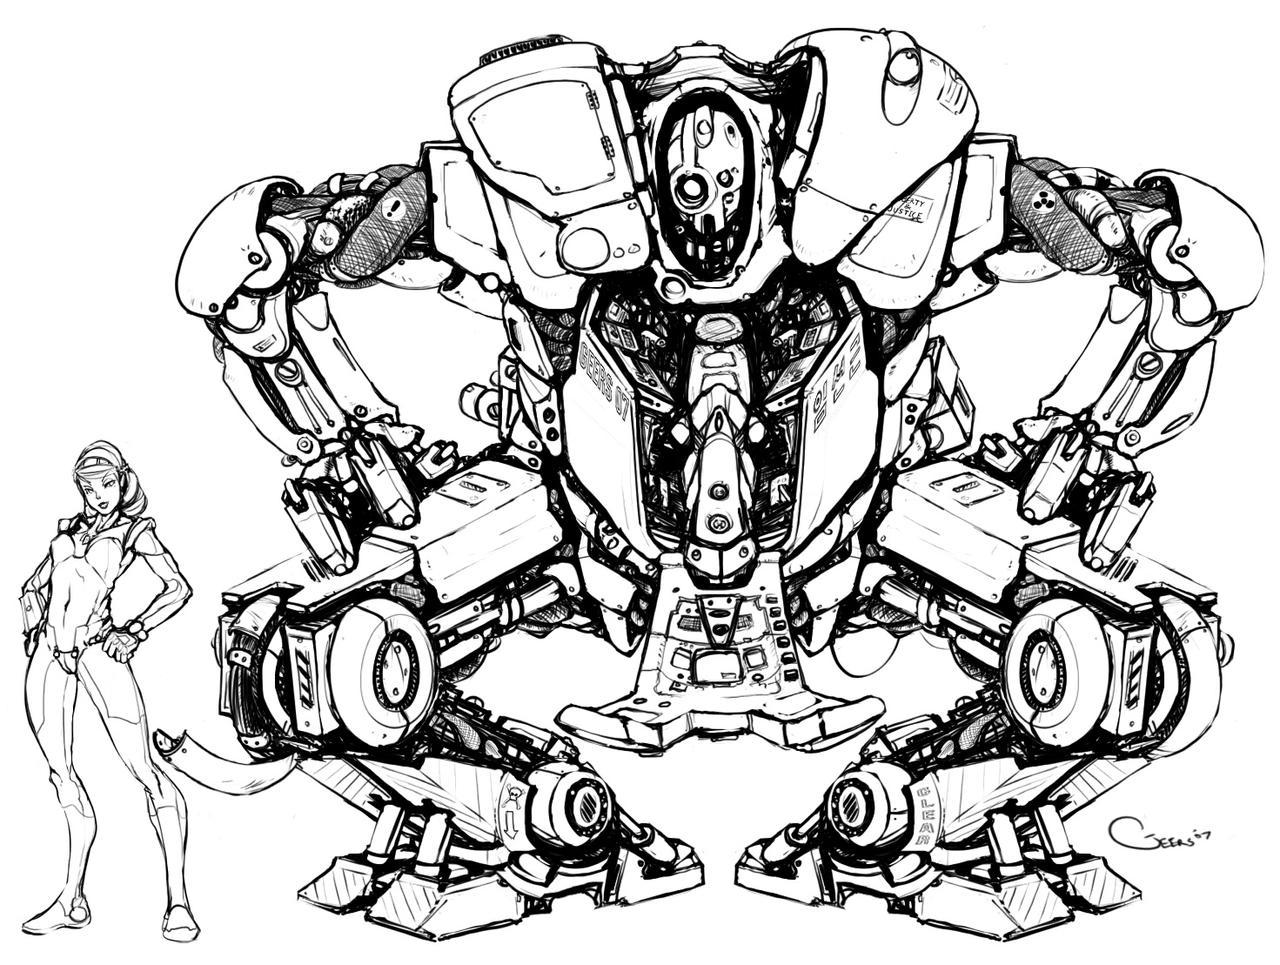 Art Line Work : Mech concept line work by darrengeers on deviantart